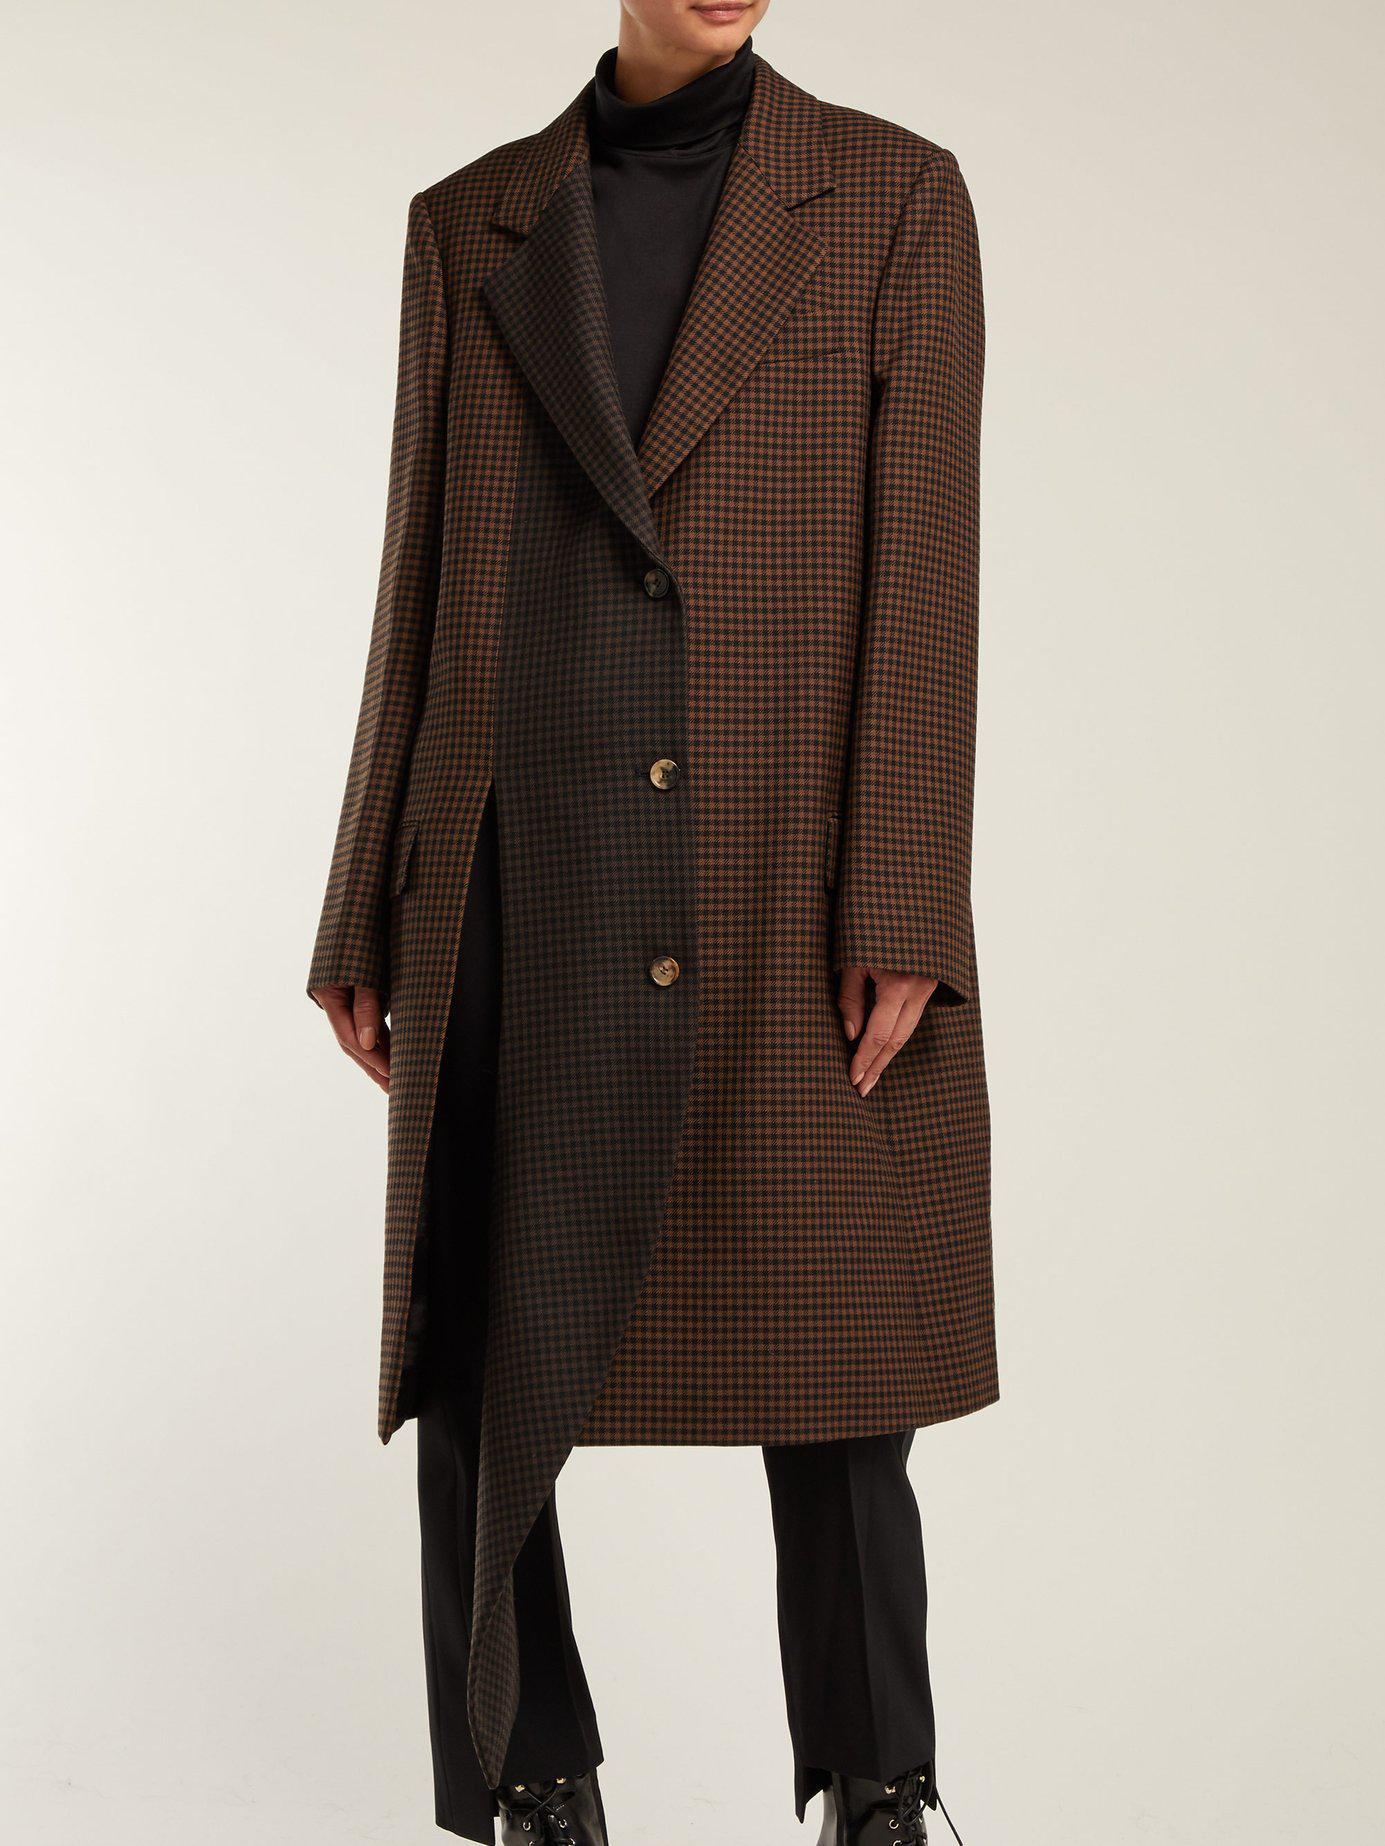 GloryA Womens Thicken Loose Overcoat Plaid Houndstooth Lapel Collar Peacoats